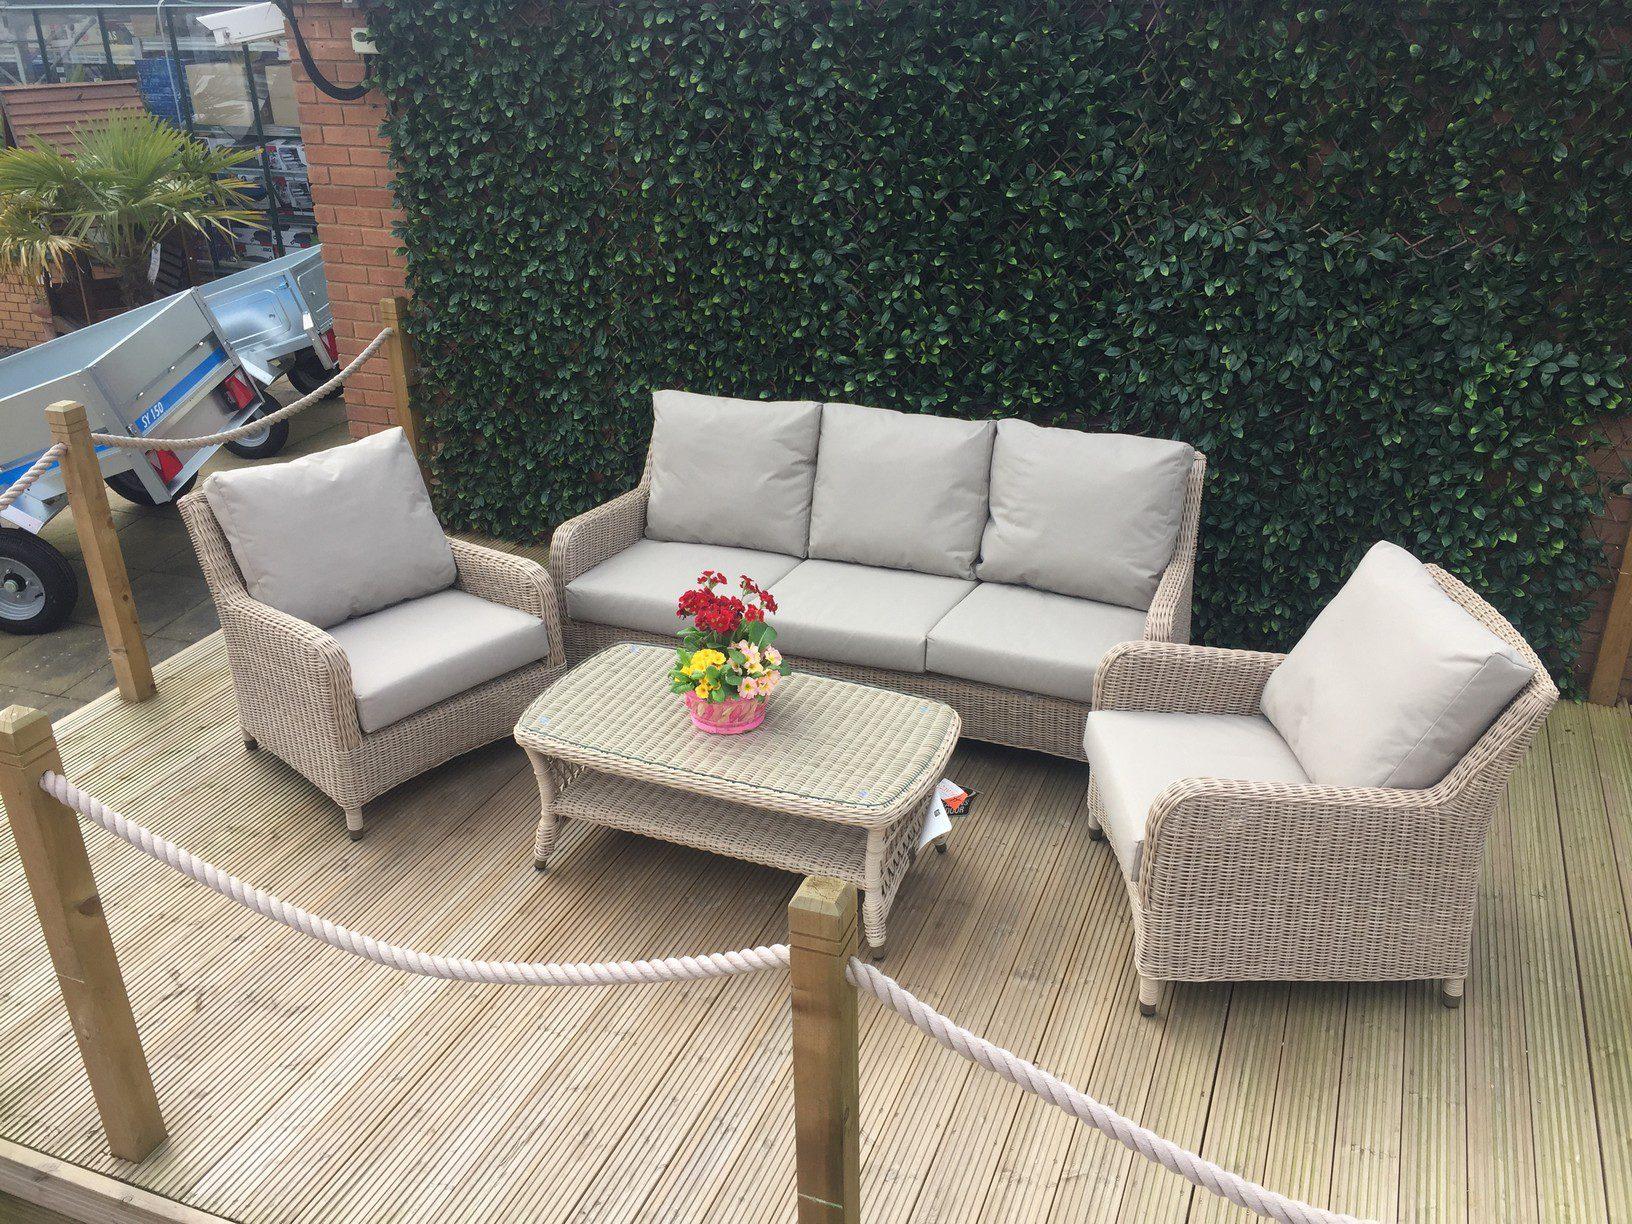 4 Seasons Outdoor Indigo Lounge Set 1